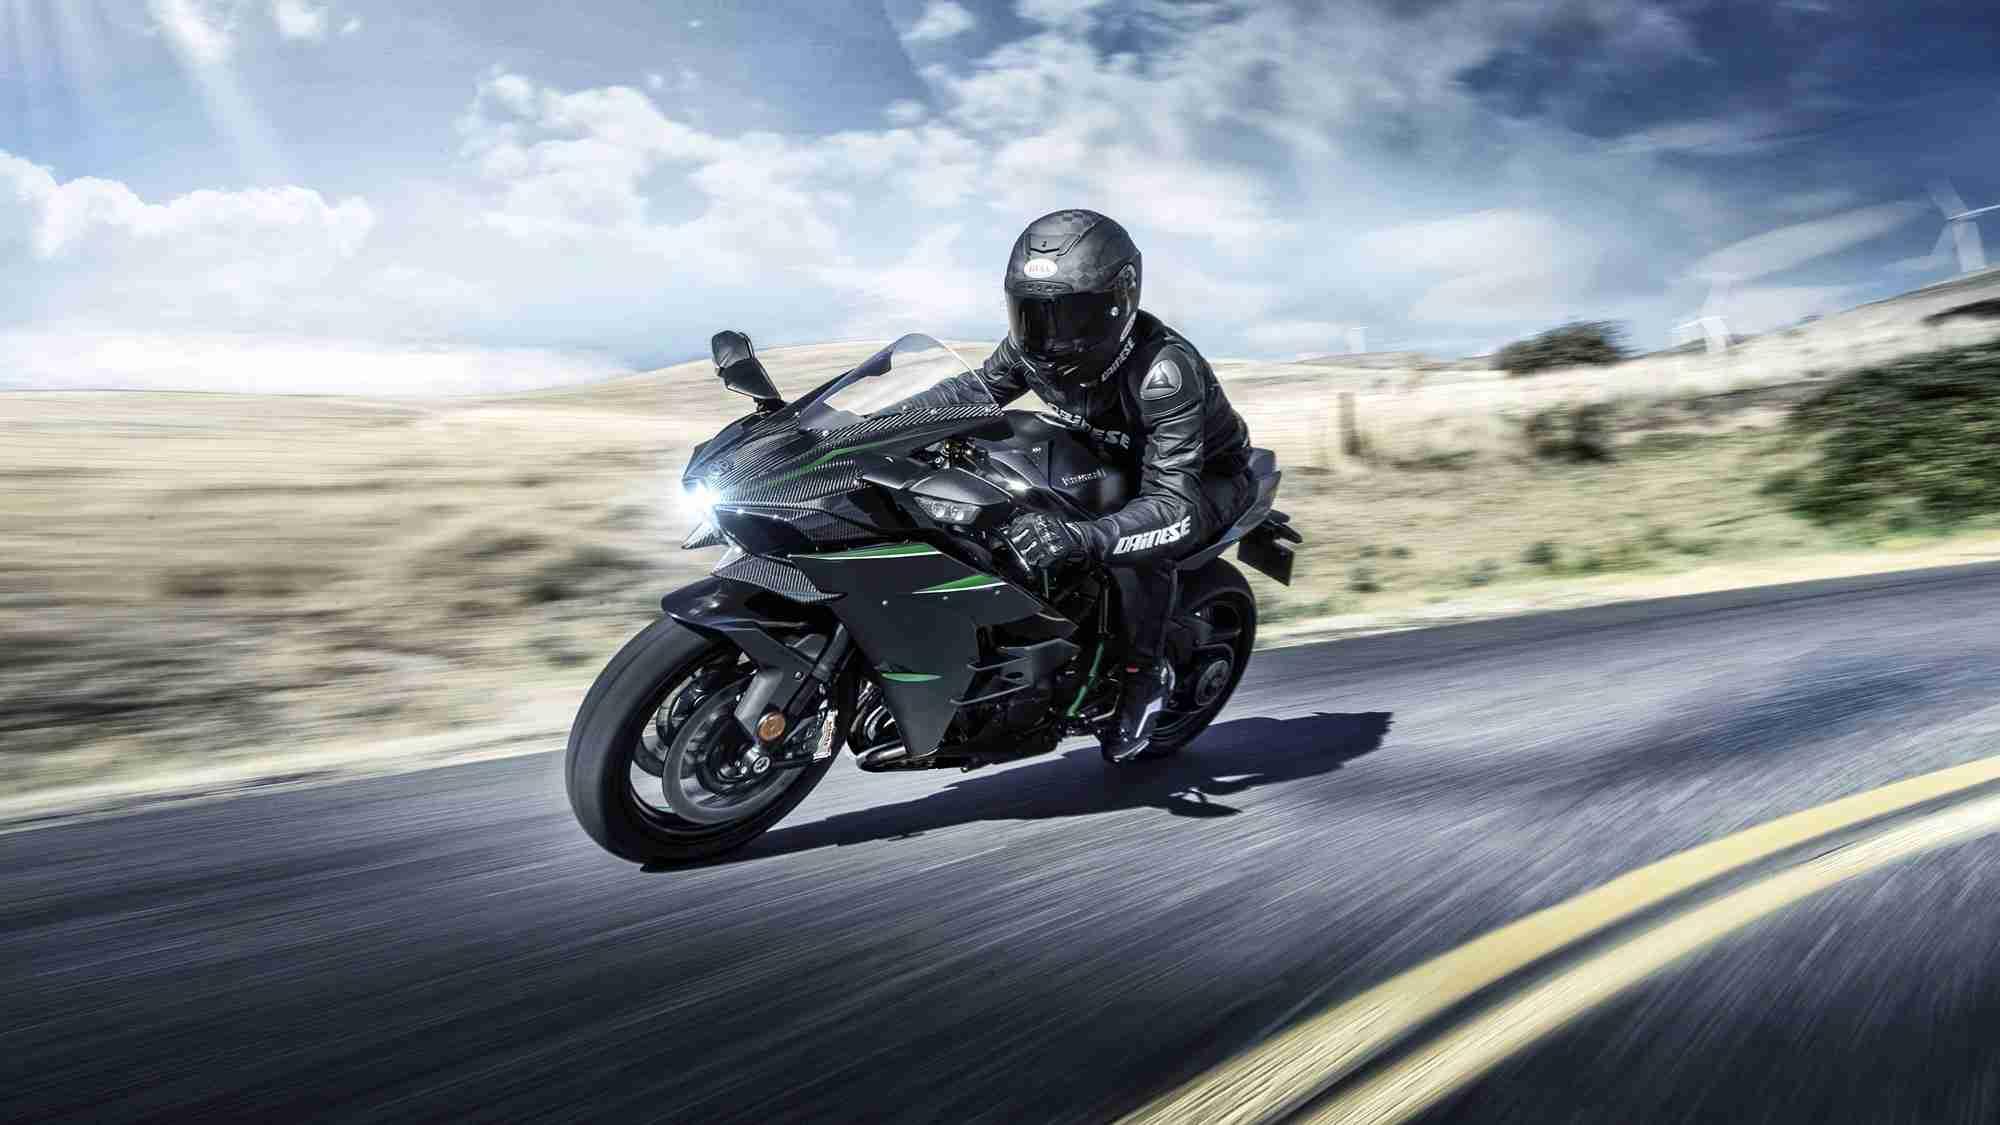 2020 Kawasaki Ninja H2 Carbon HD wallpaper